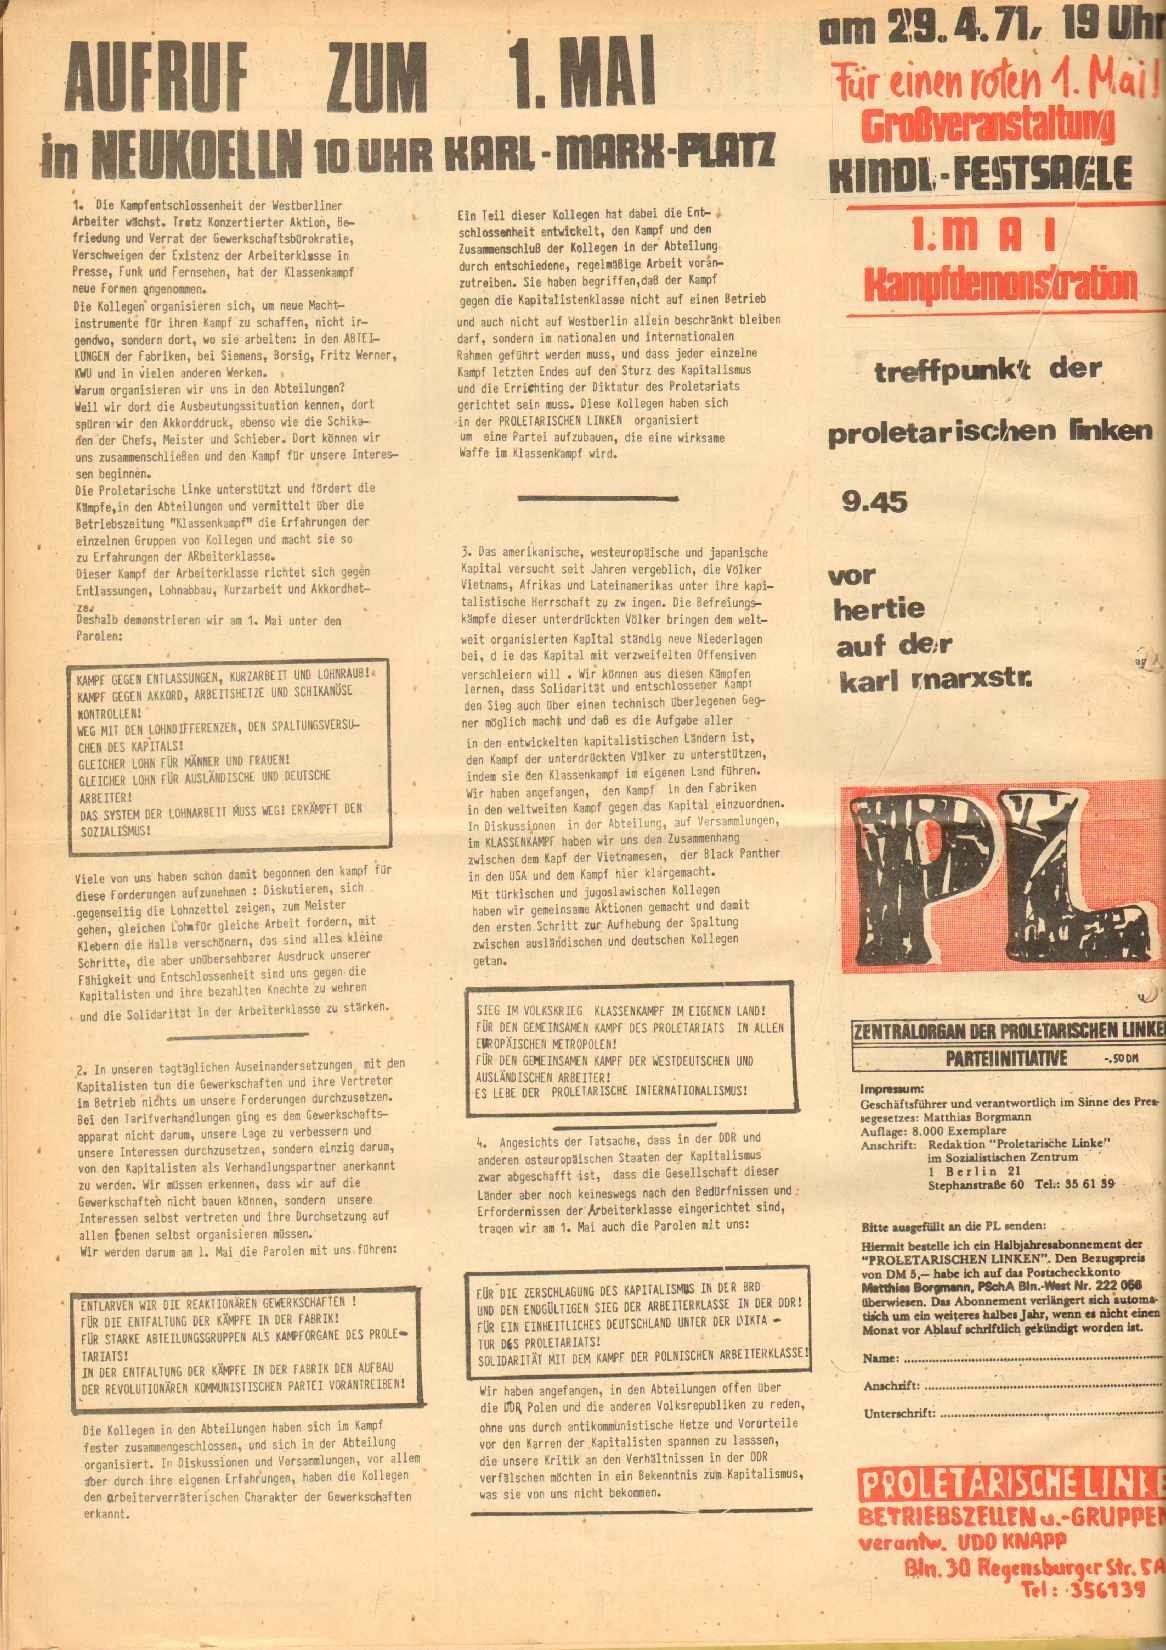 Berlin_Klassenkampf_1971_Mai_04